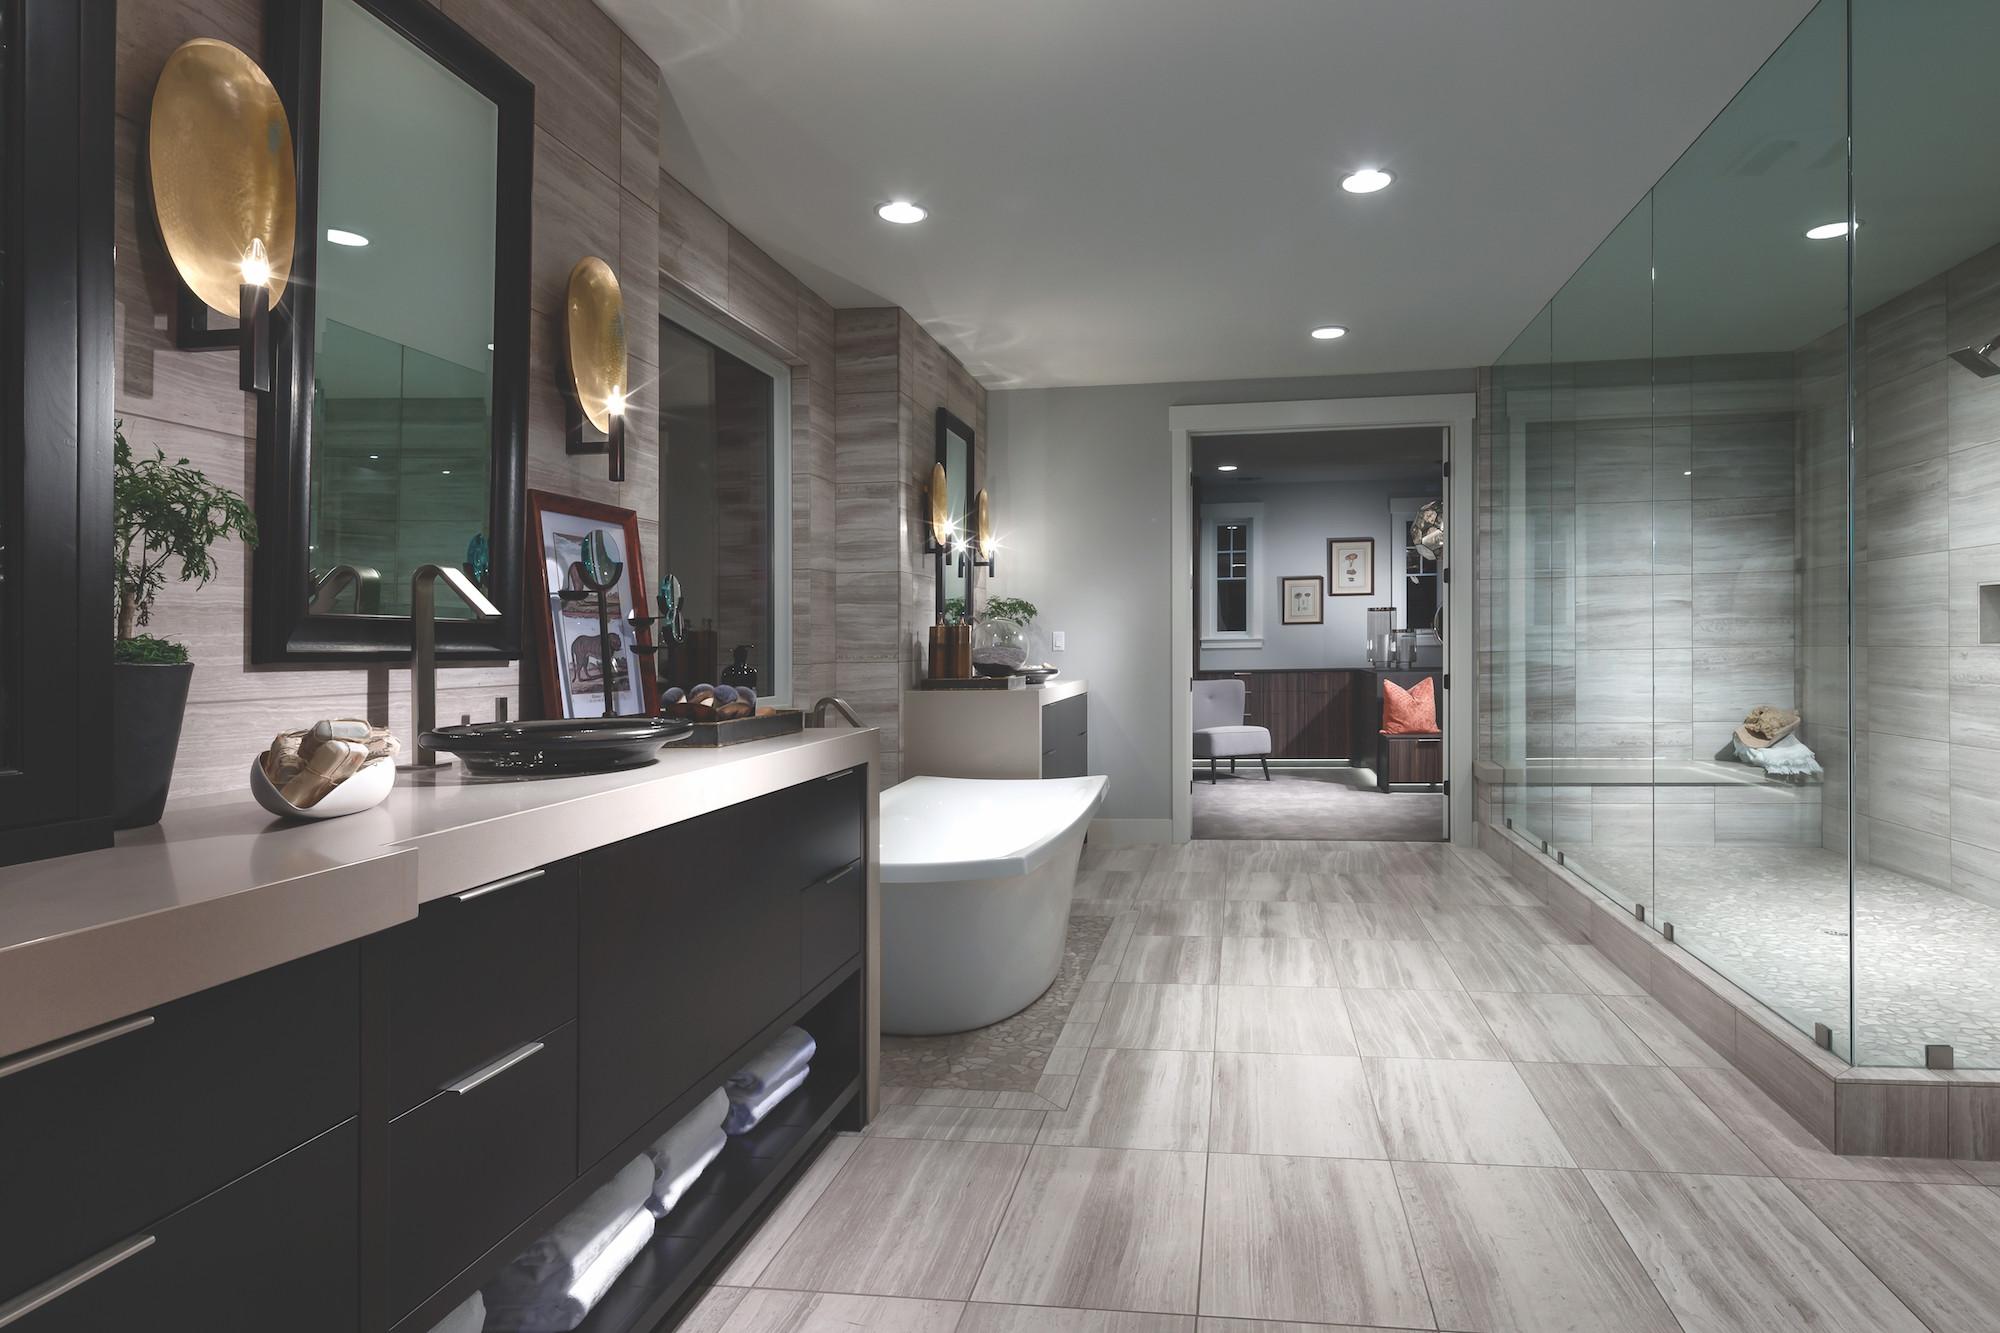 Master Bathroom Ideas Photo Gallery  25 Luxury Bathroom Ideas & Designs